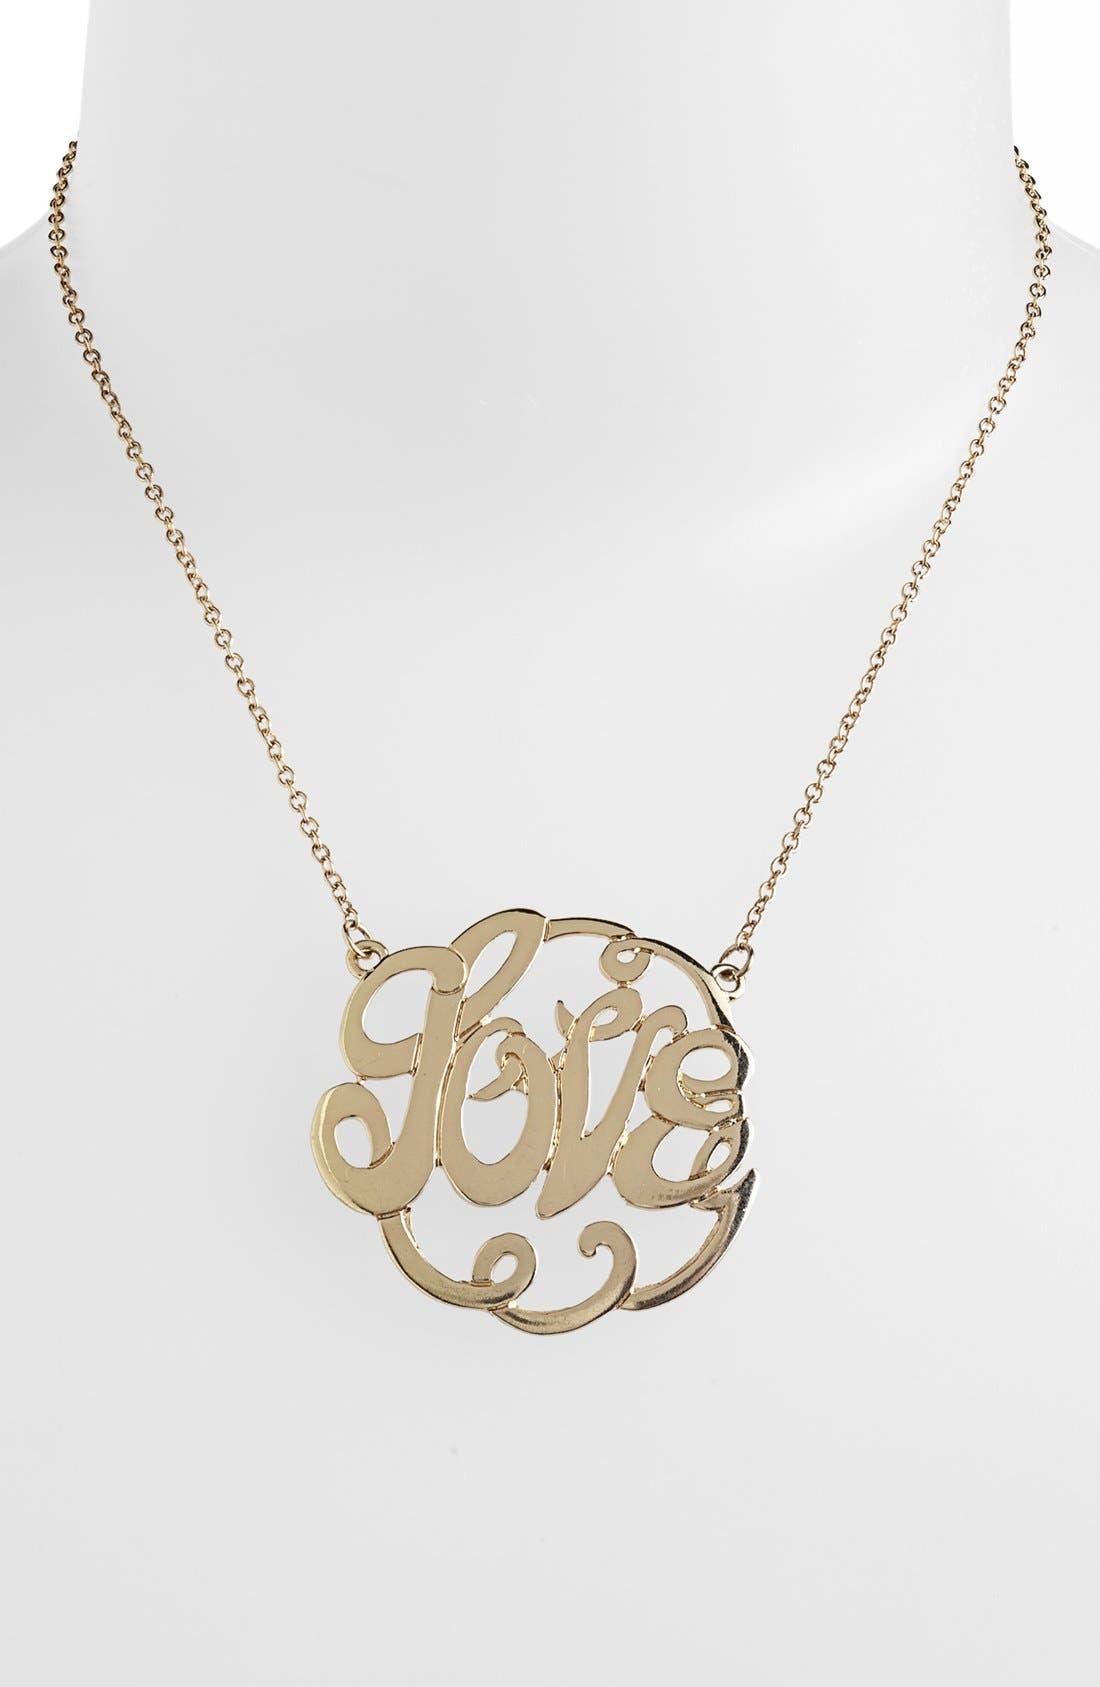 Alternate Image 1 Selected - Stephan & Co. 'Love' Script Pendant Necklace (Juniors) (Online Only)